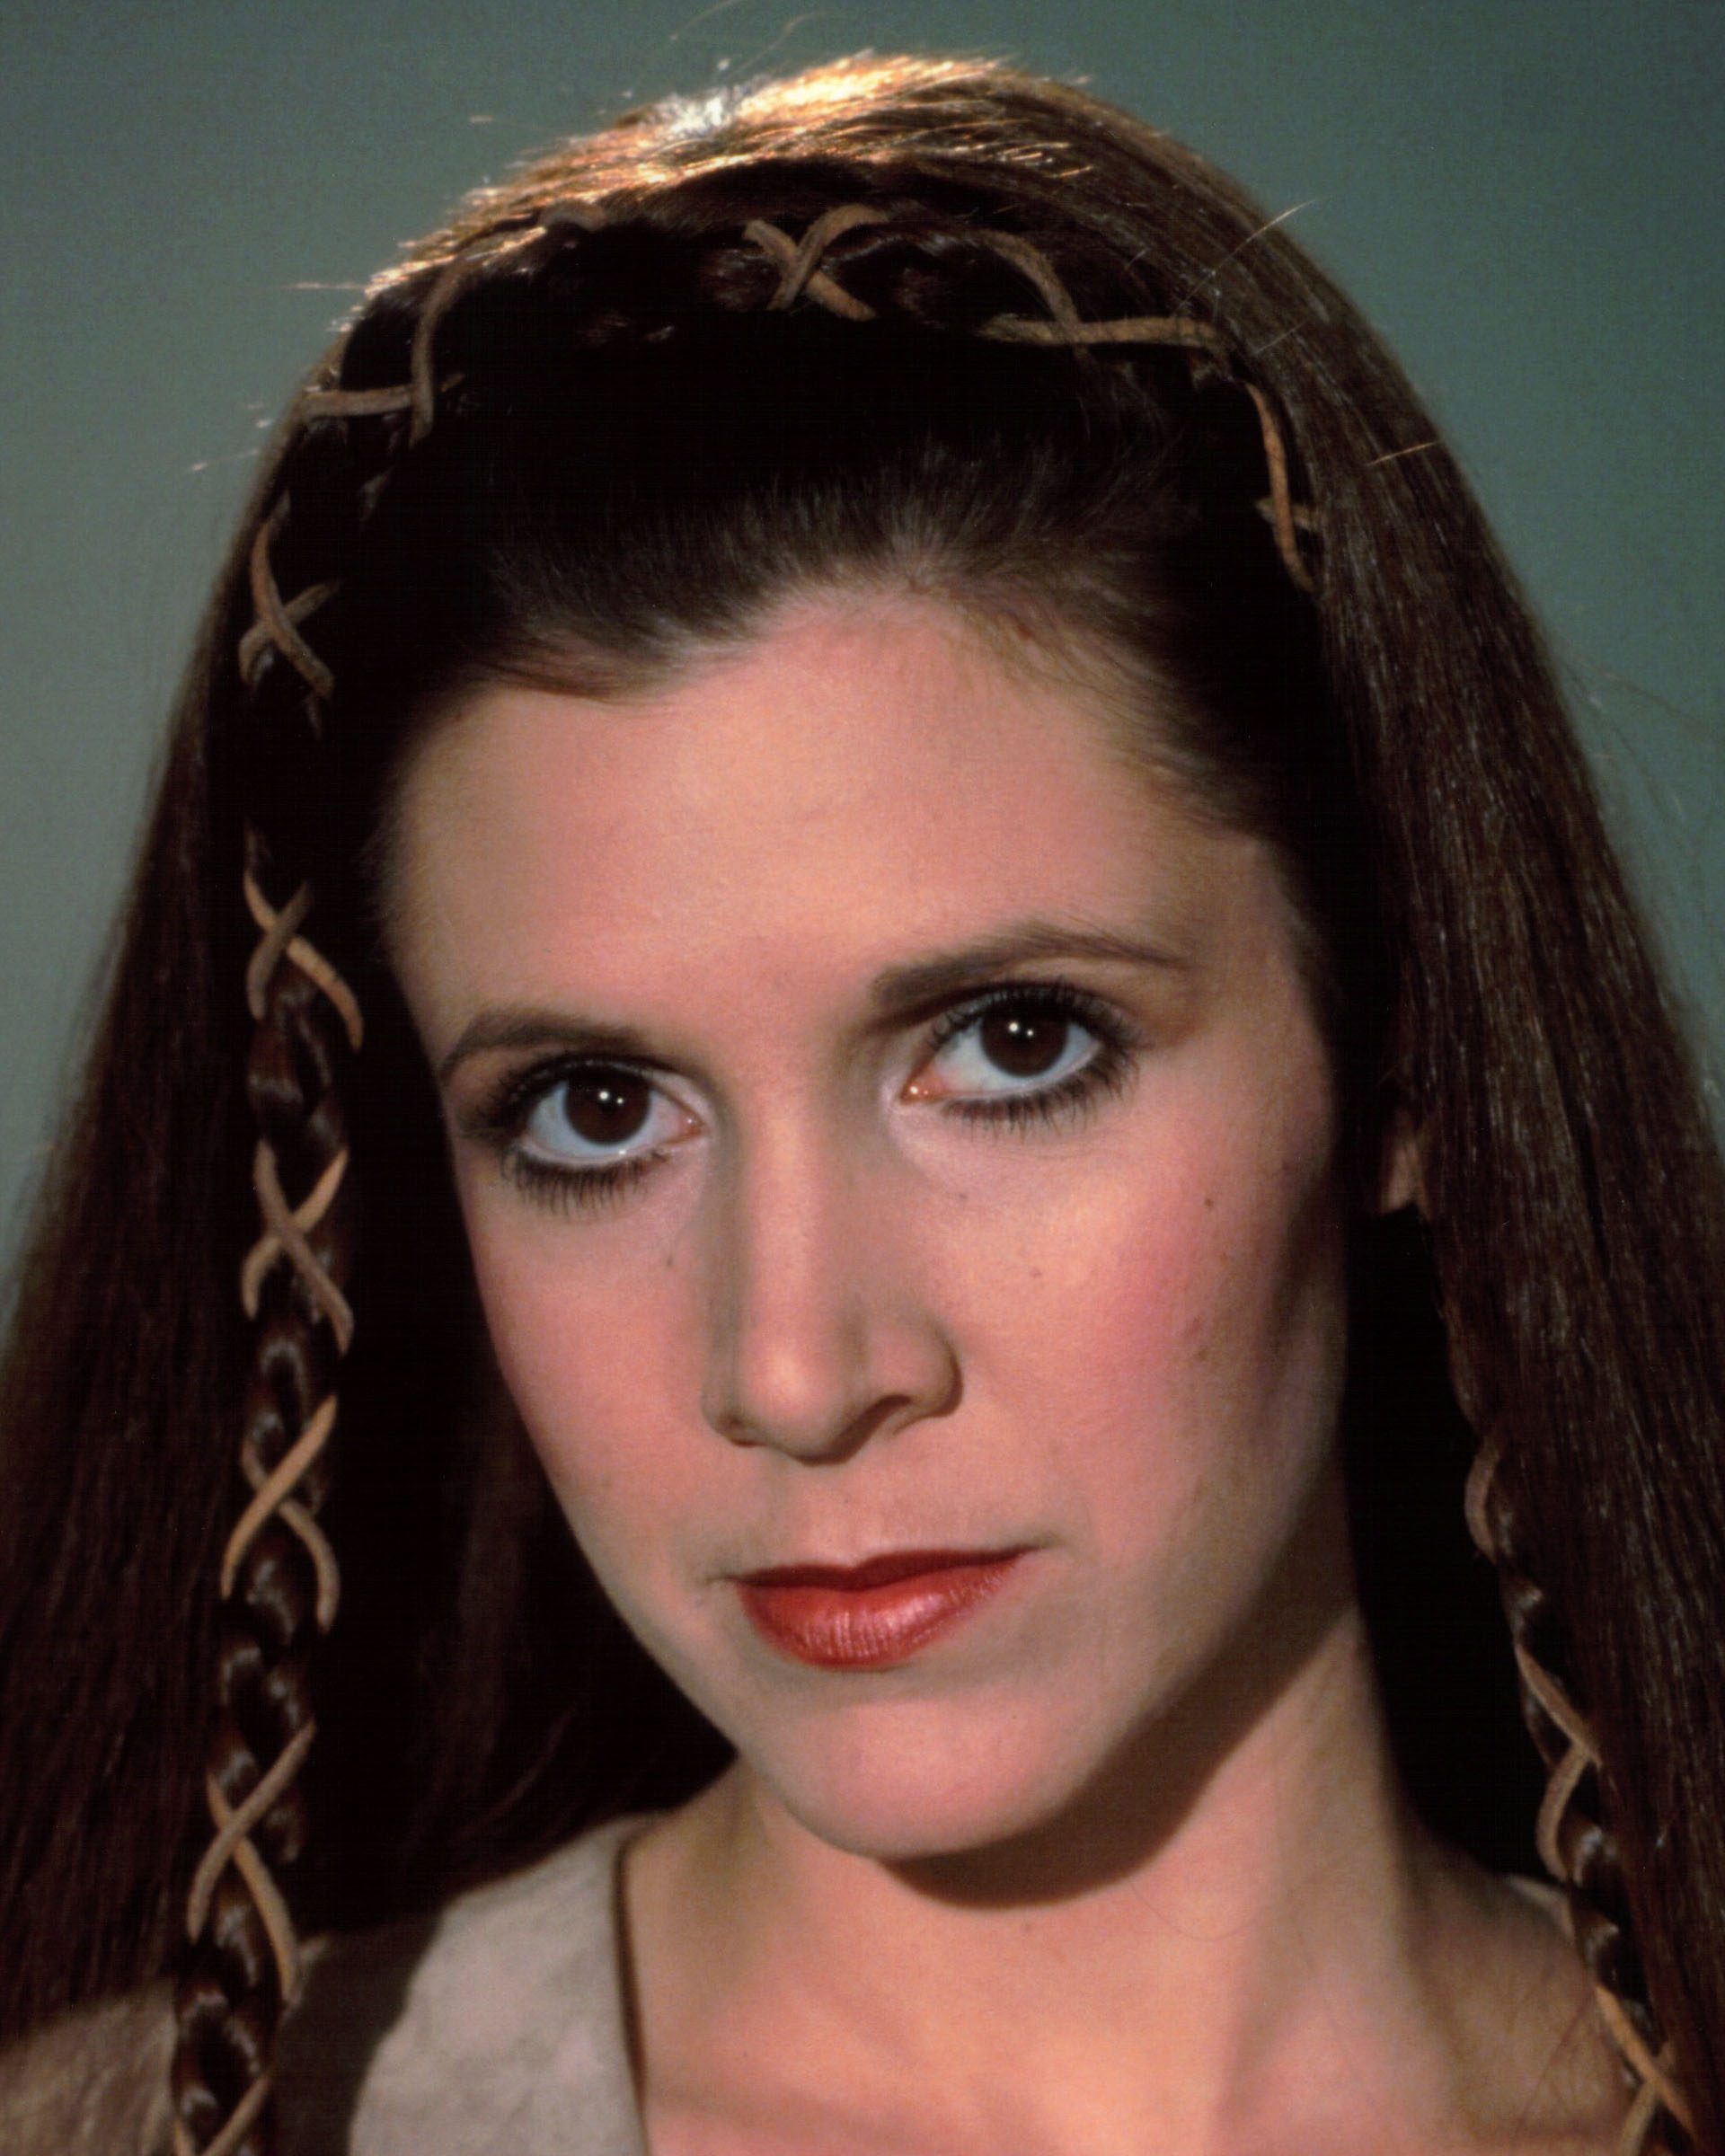 Leia Organa | Star Wars Wiki | Fandom powered by Wikia How Old Is Princess Leia In Star Wars Rebels